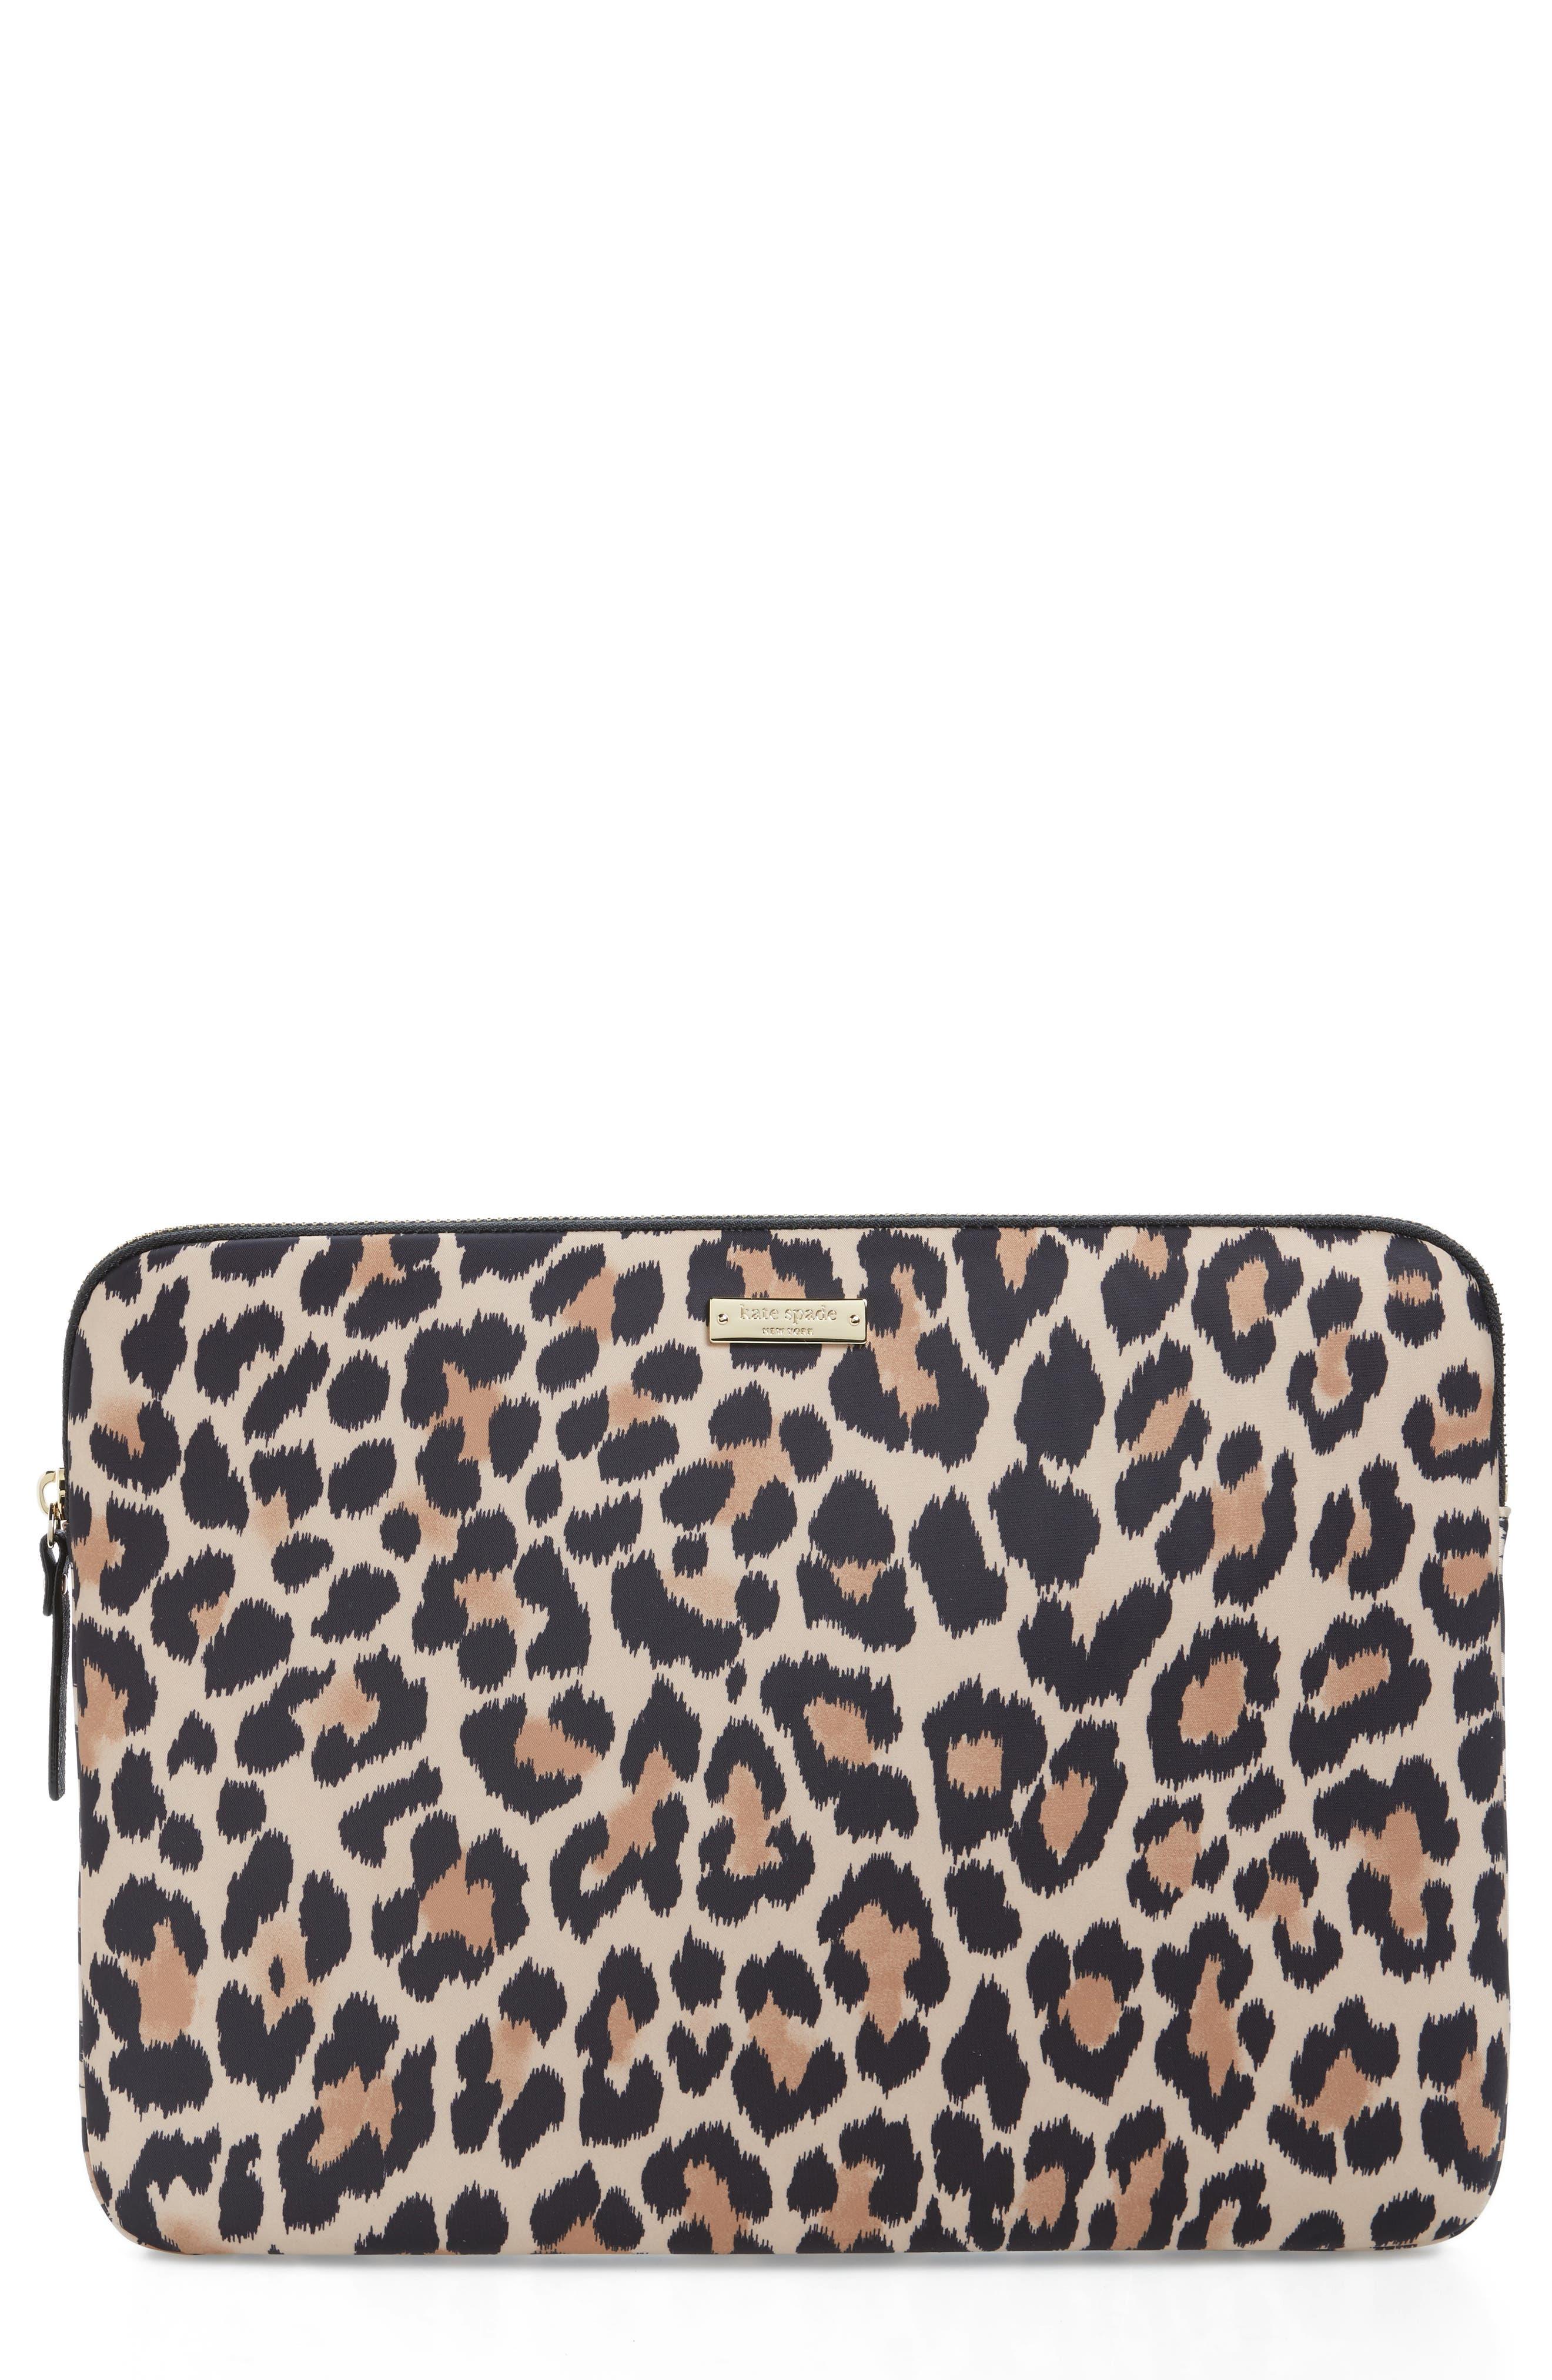 leopard 13-Inch laptop sleeve,                             Main thumbnail 1, color,                             200